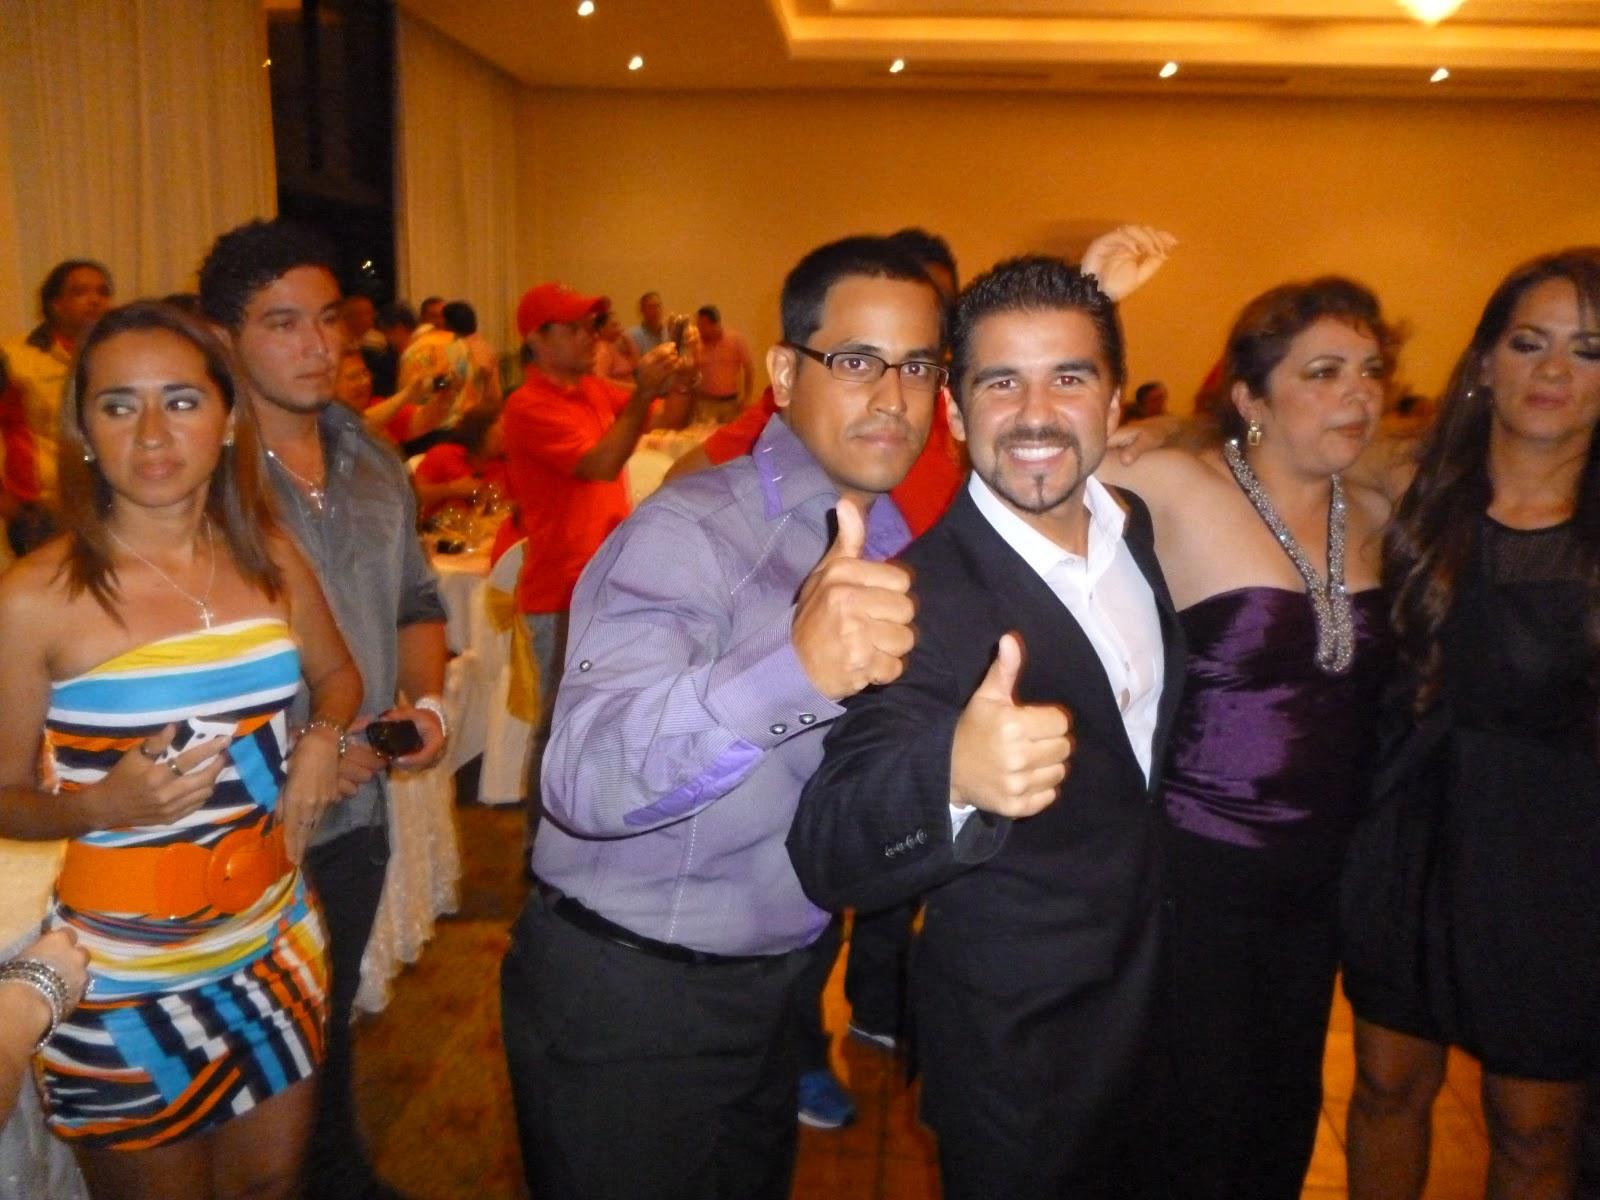 Written By Jorge Jované on sábado, 11 de febrero de 2012 | 20:42